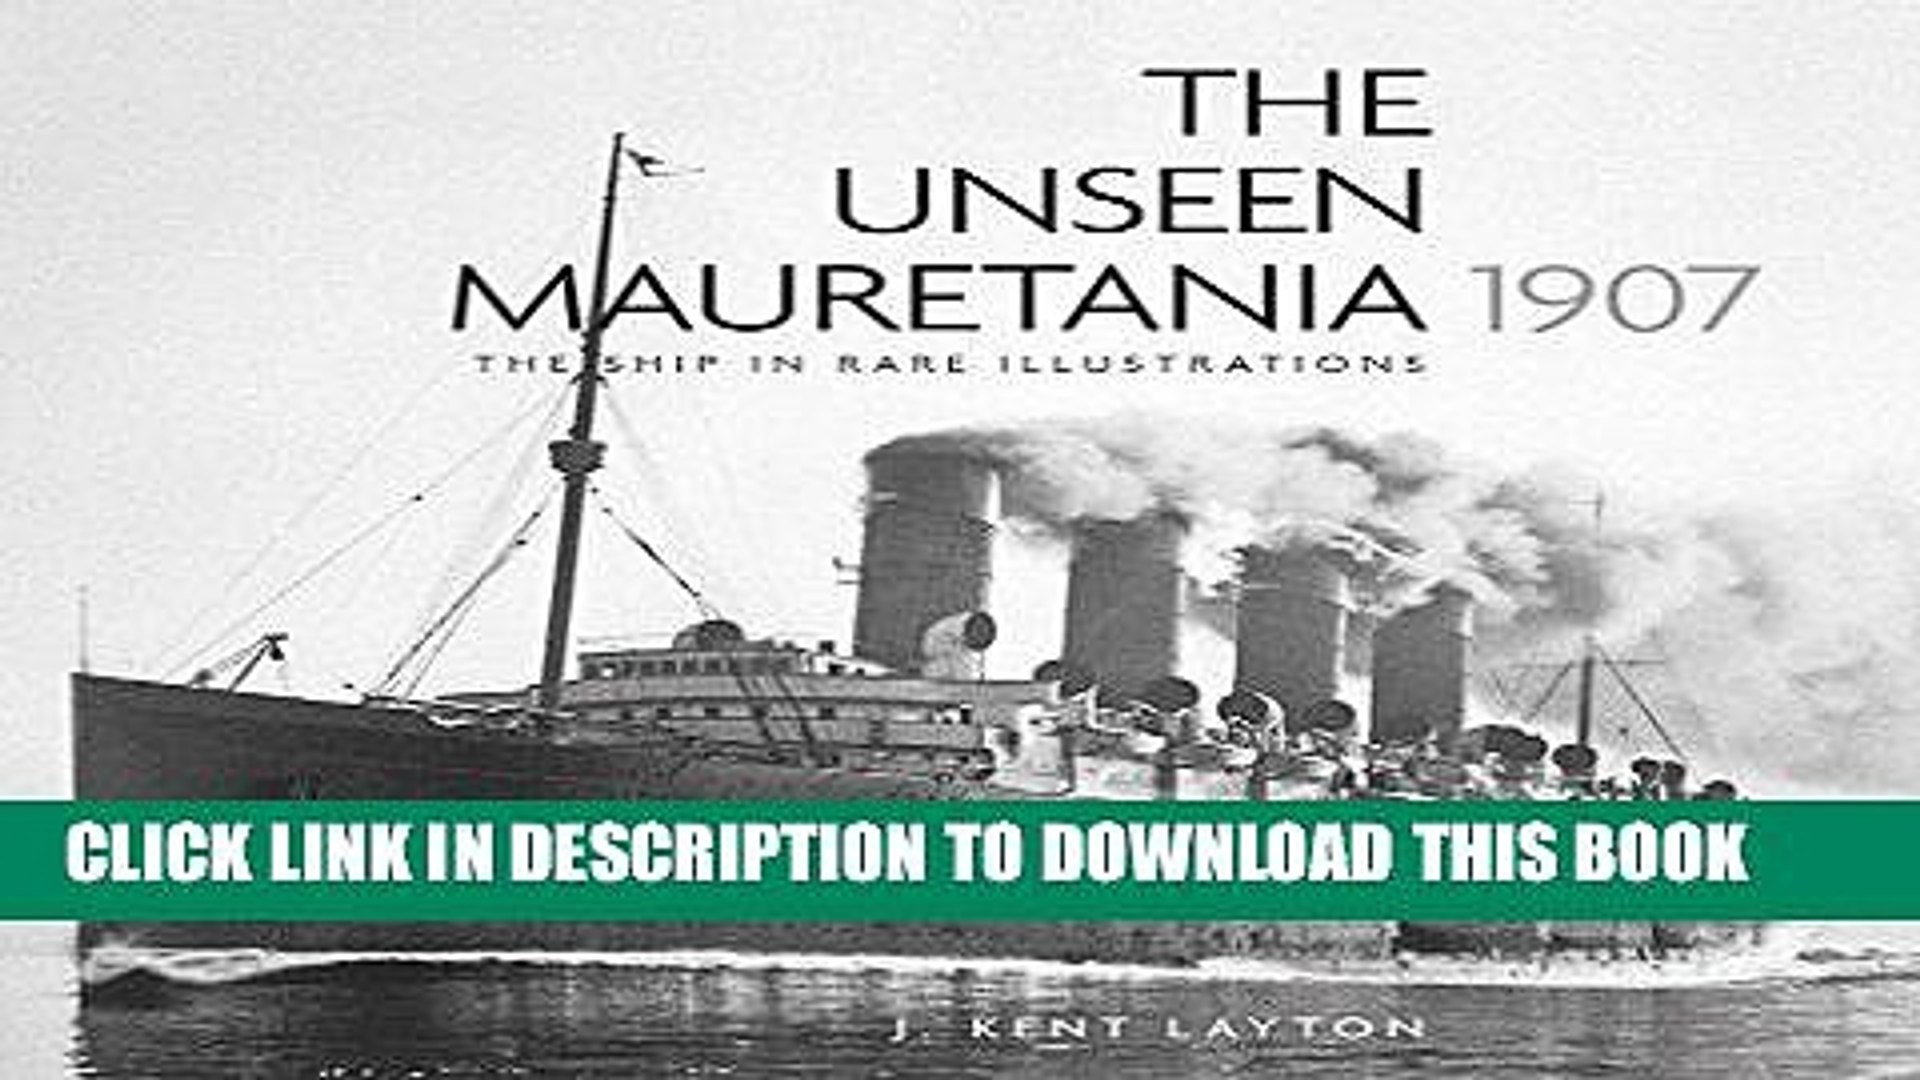 The Unseen Mauretania The Ship in Rare Illustrations 1907